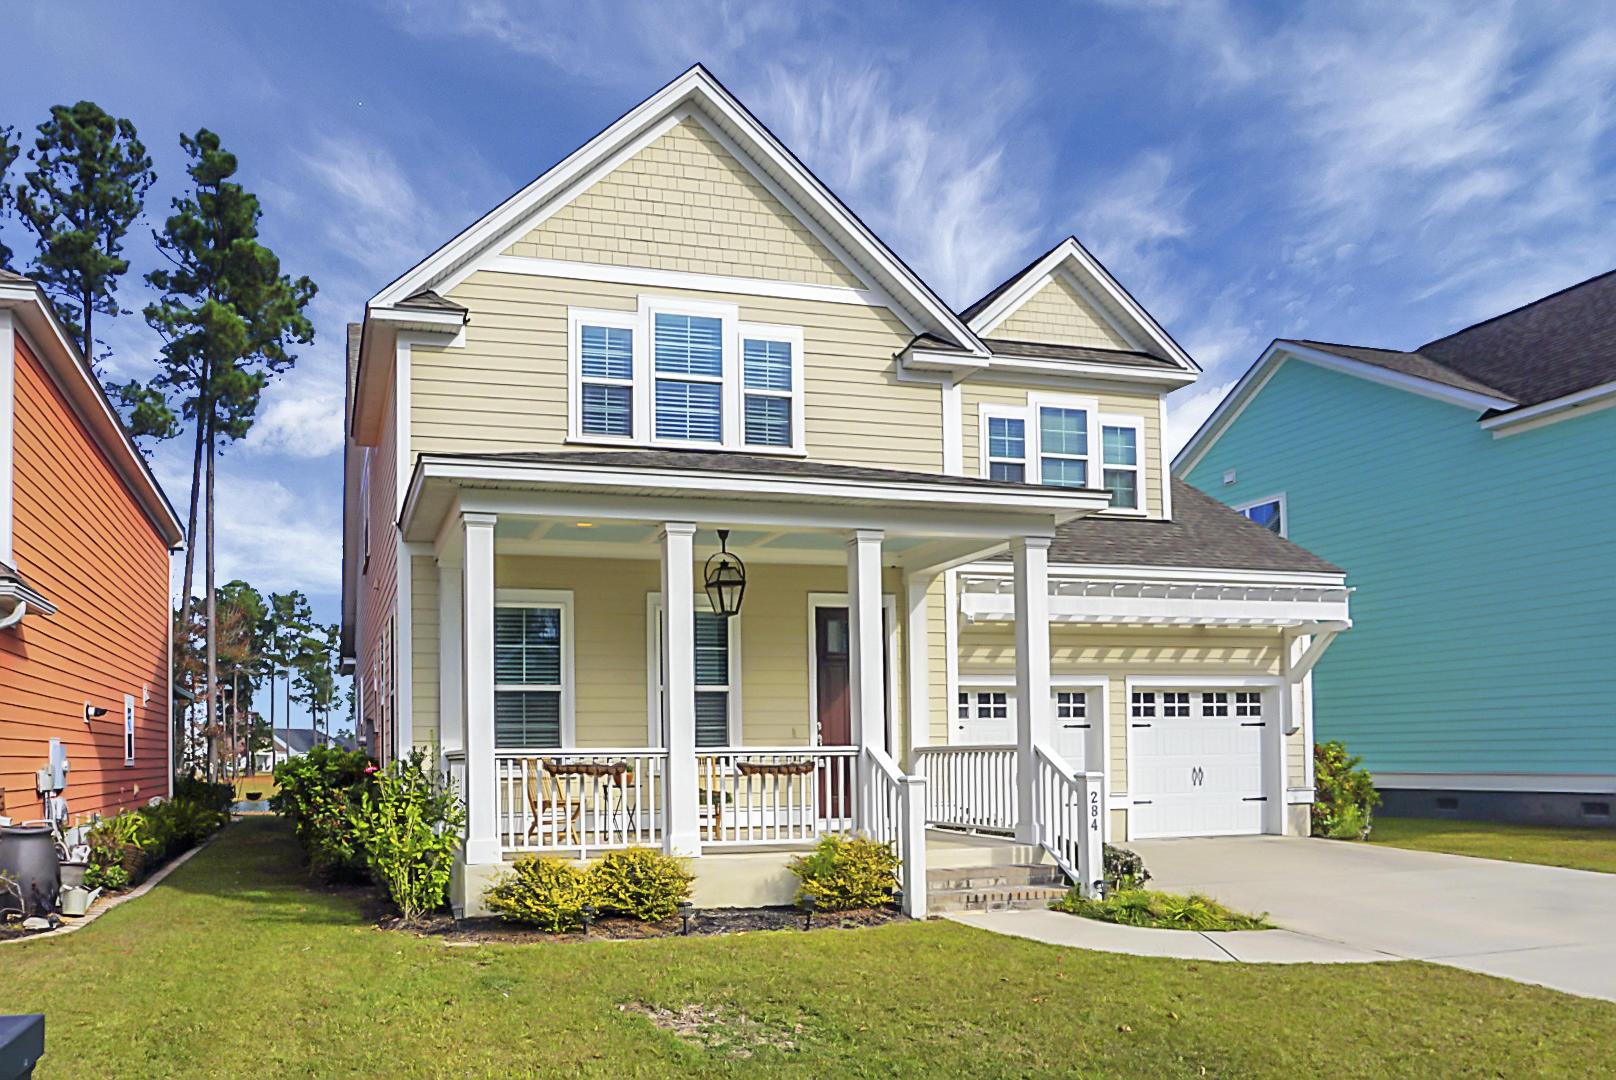 Cane Bay Plantation Homes For Sale - 284 Calm Water, Summerville, SC - 28